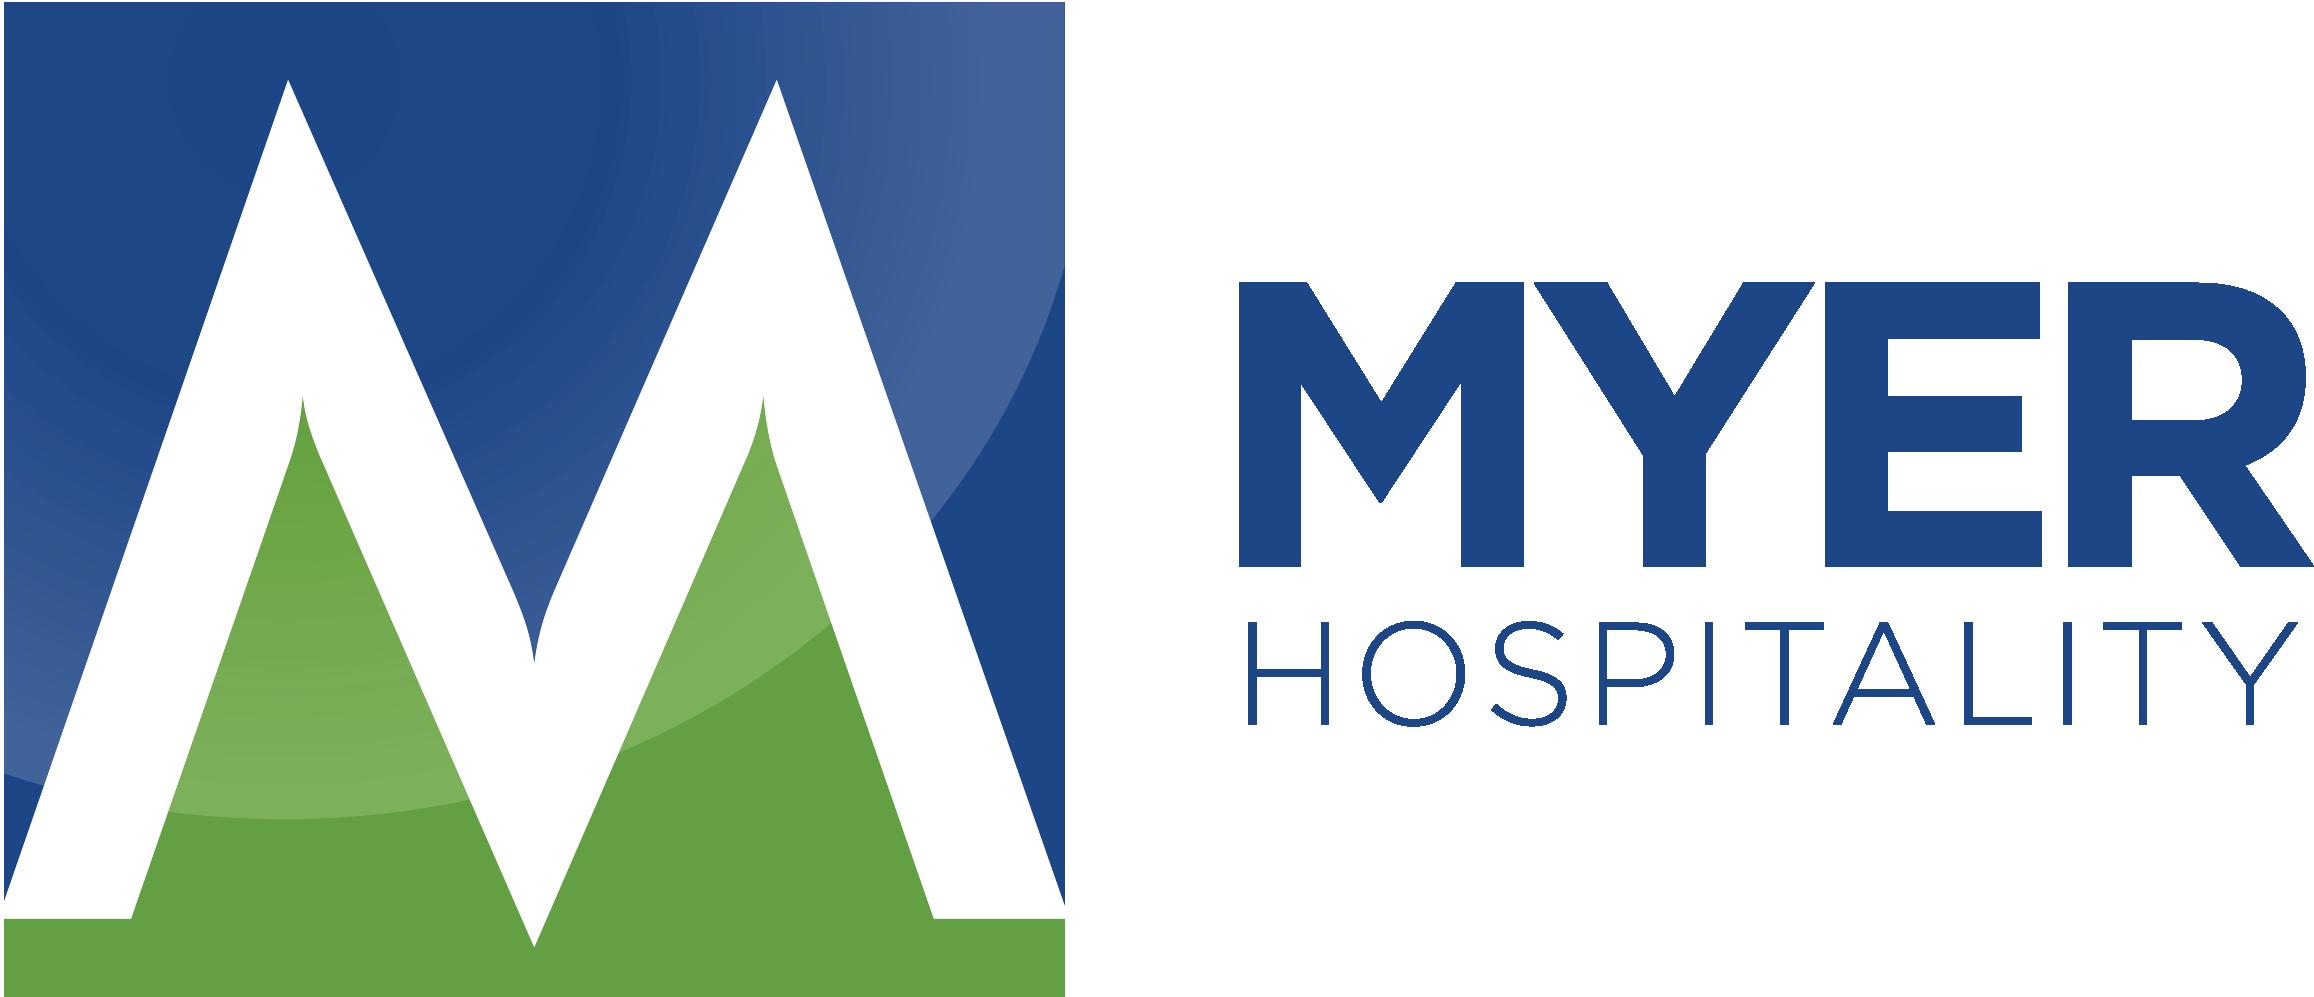 Myer hospitality logo horizontal original